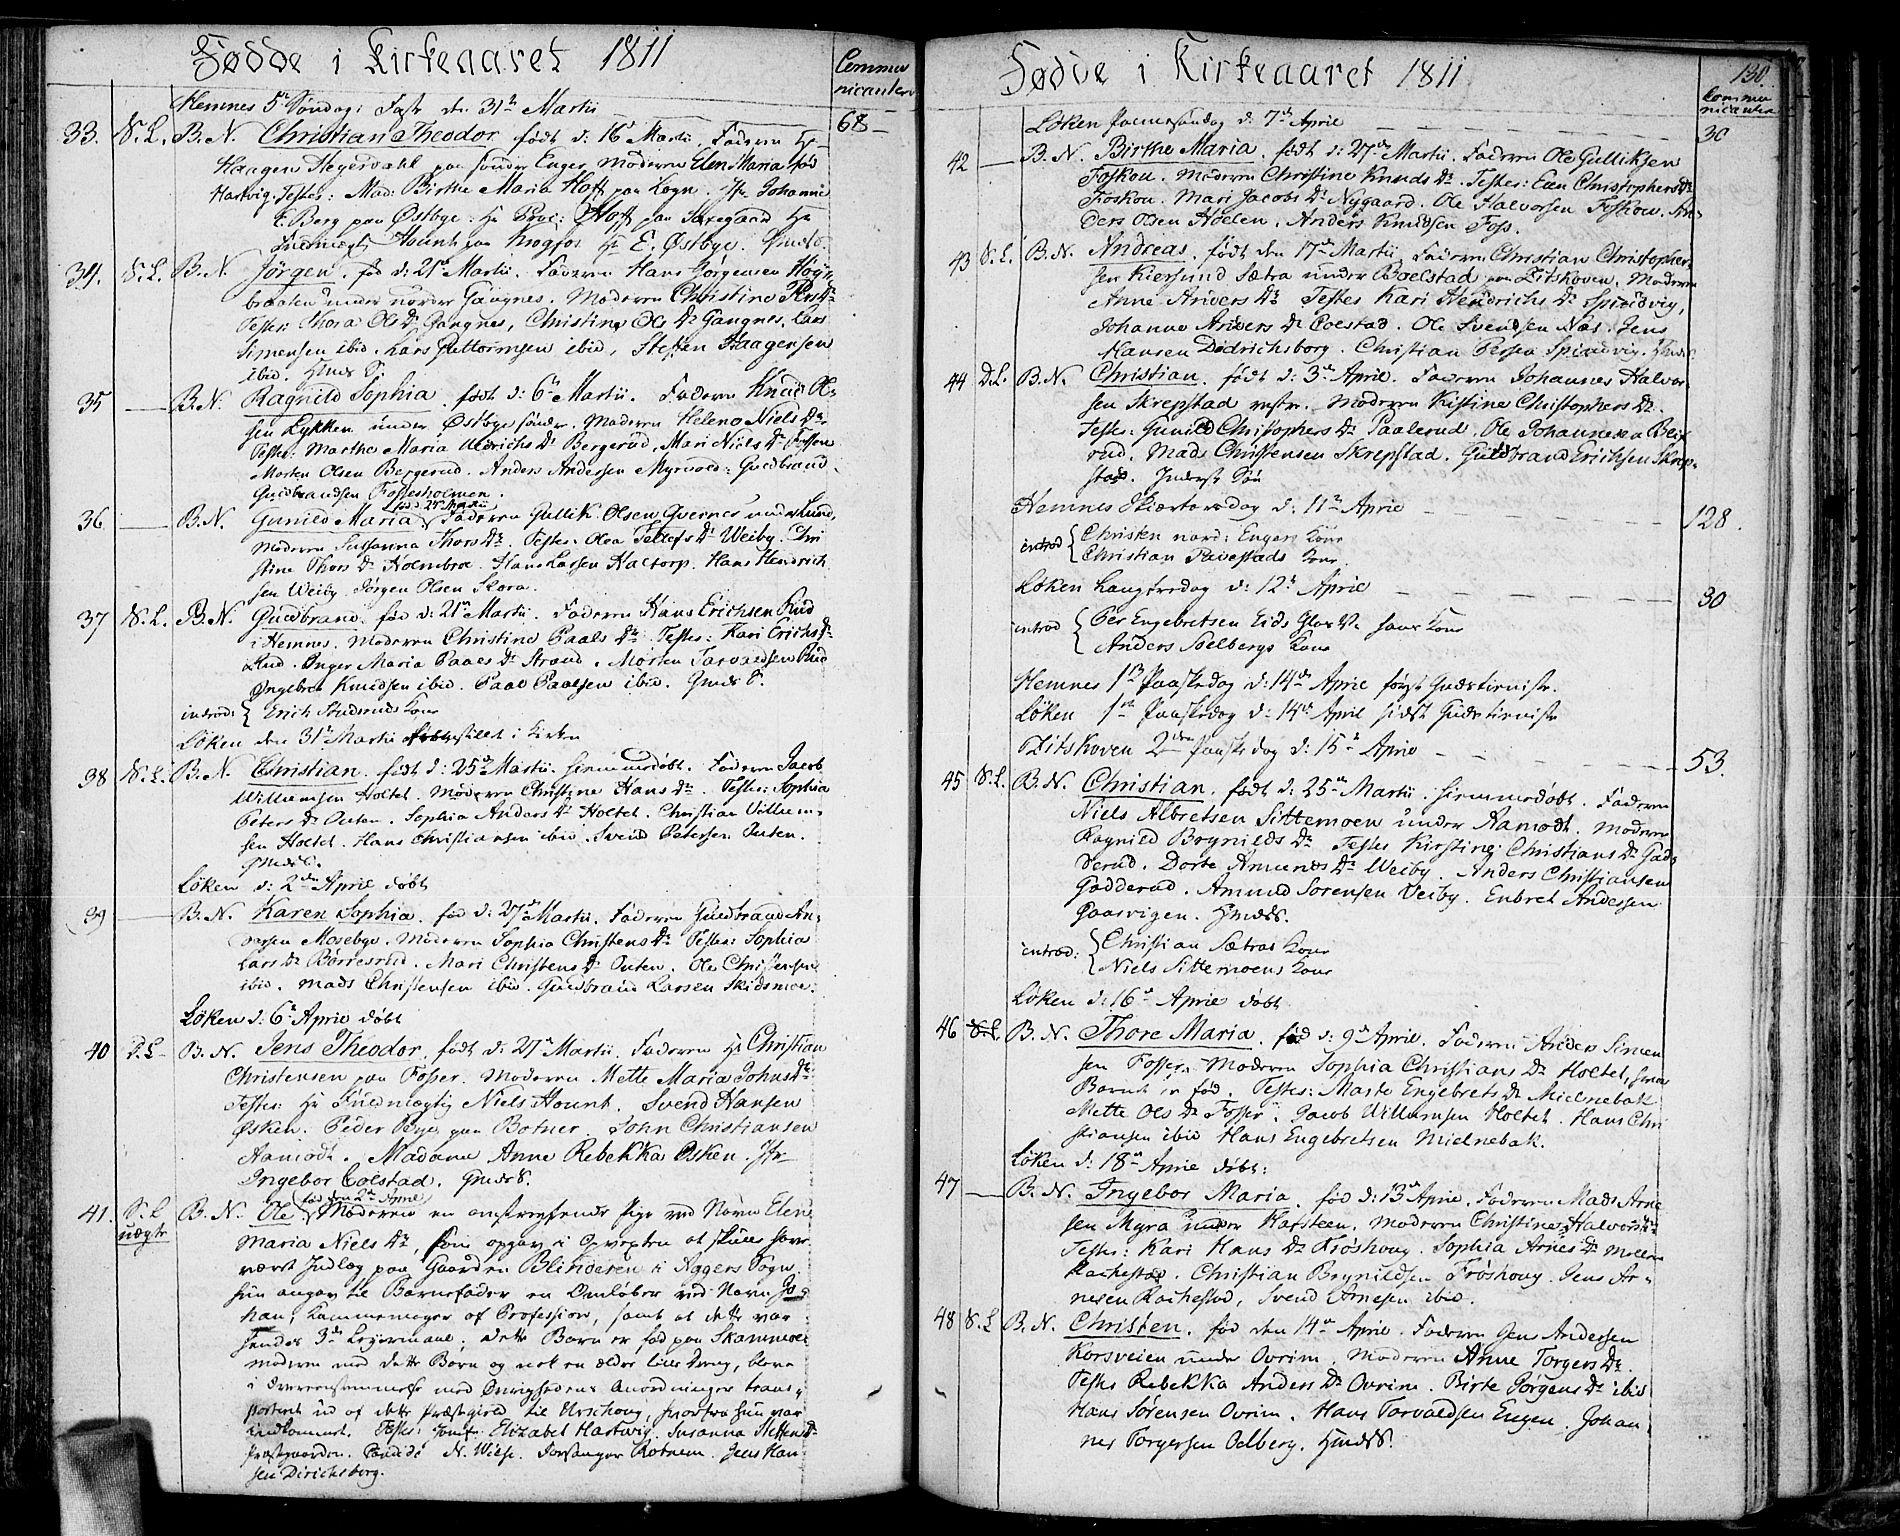 SAO, Høland prestekontor Kirkebøker, F/Fa/L0006: Ministerialbok nr. I 6, 1794-1814, s. 130